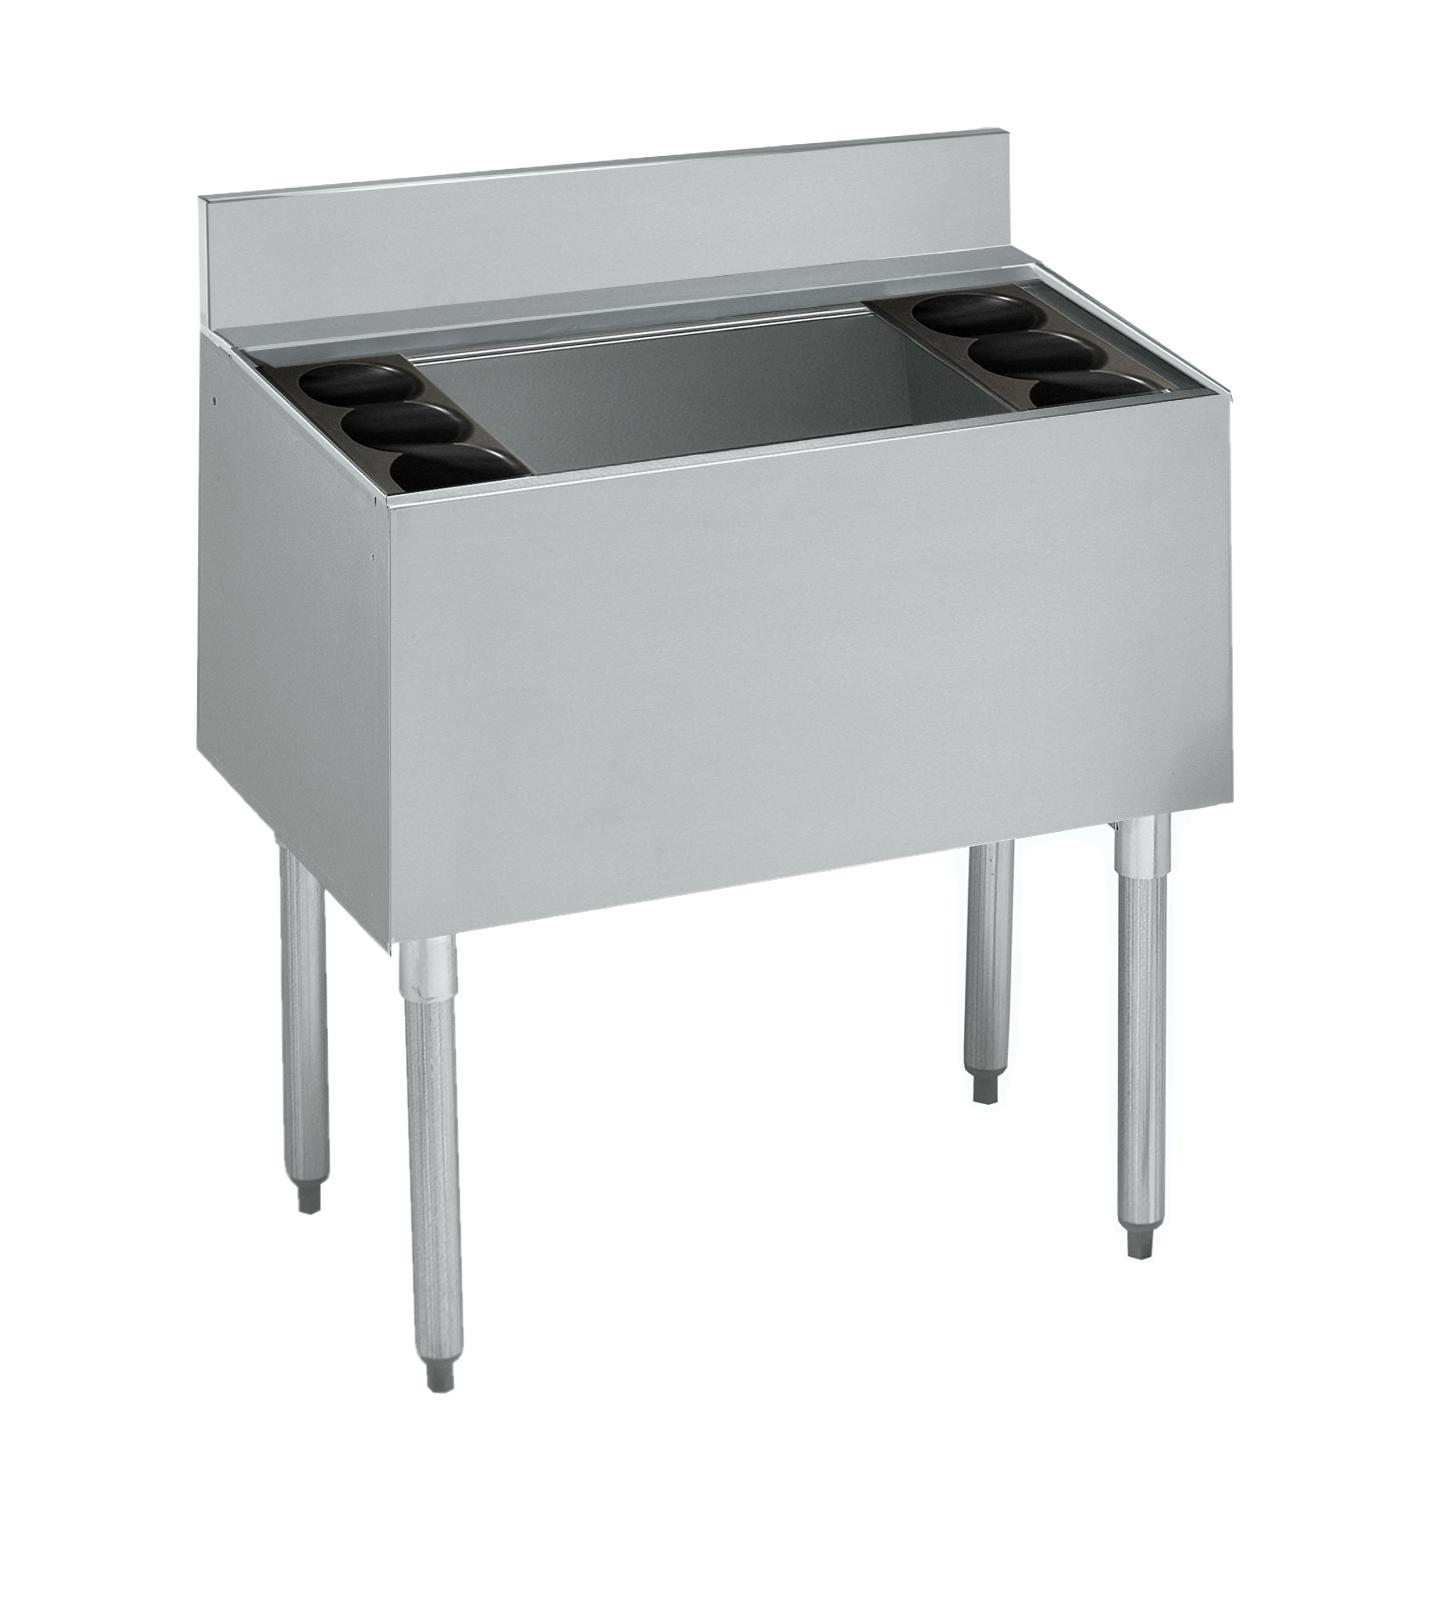 Krowne Metal 21-30 underbar ice bin/cocktail unit